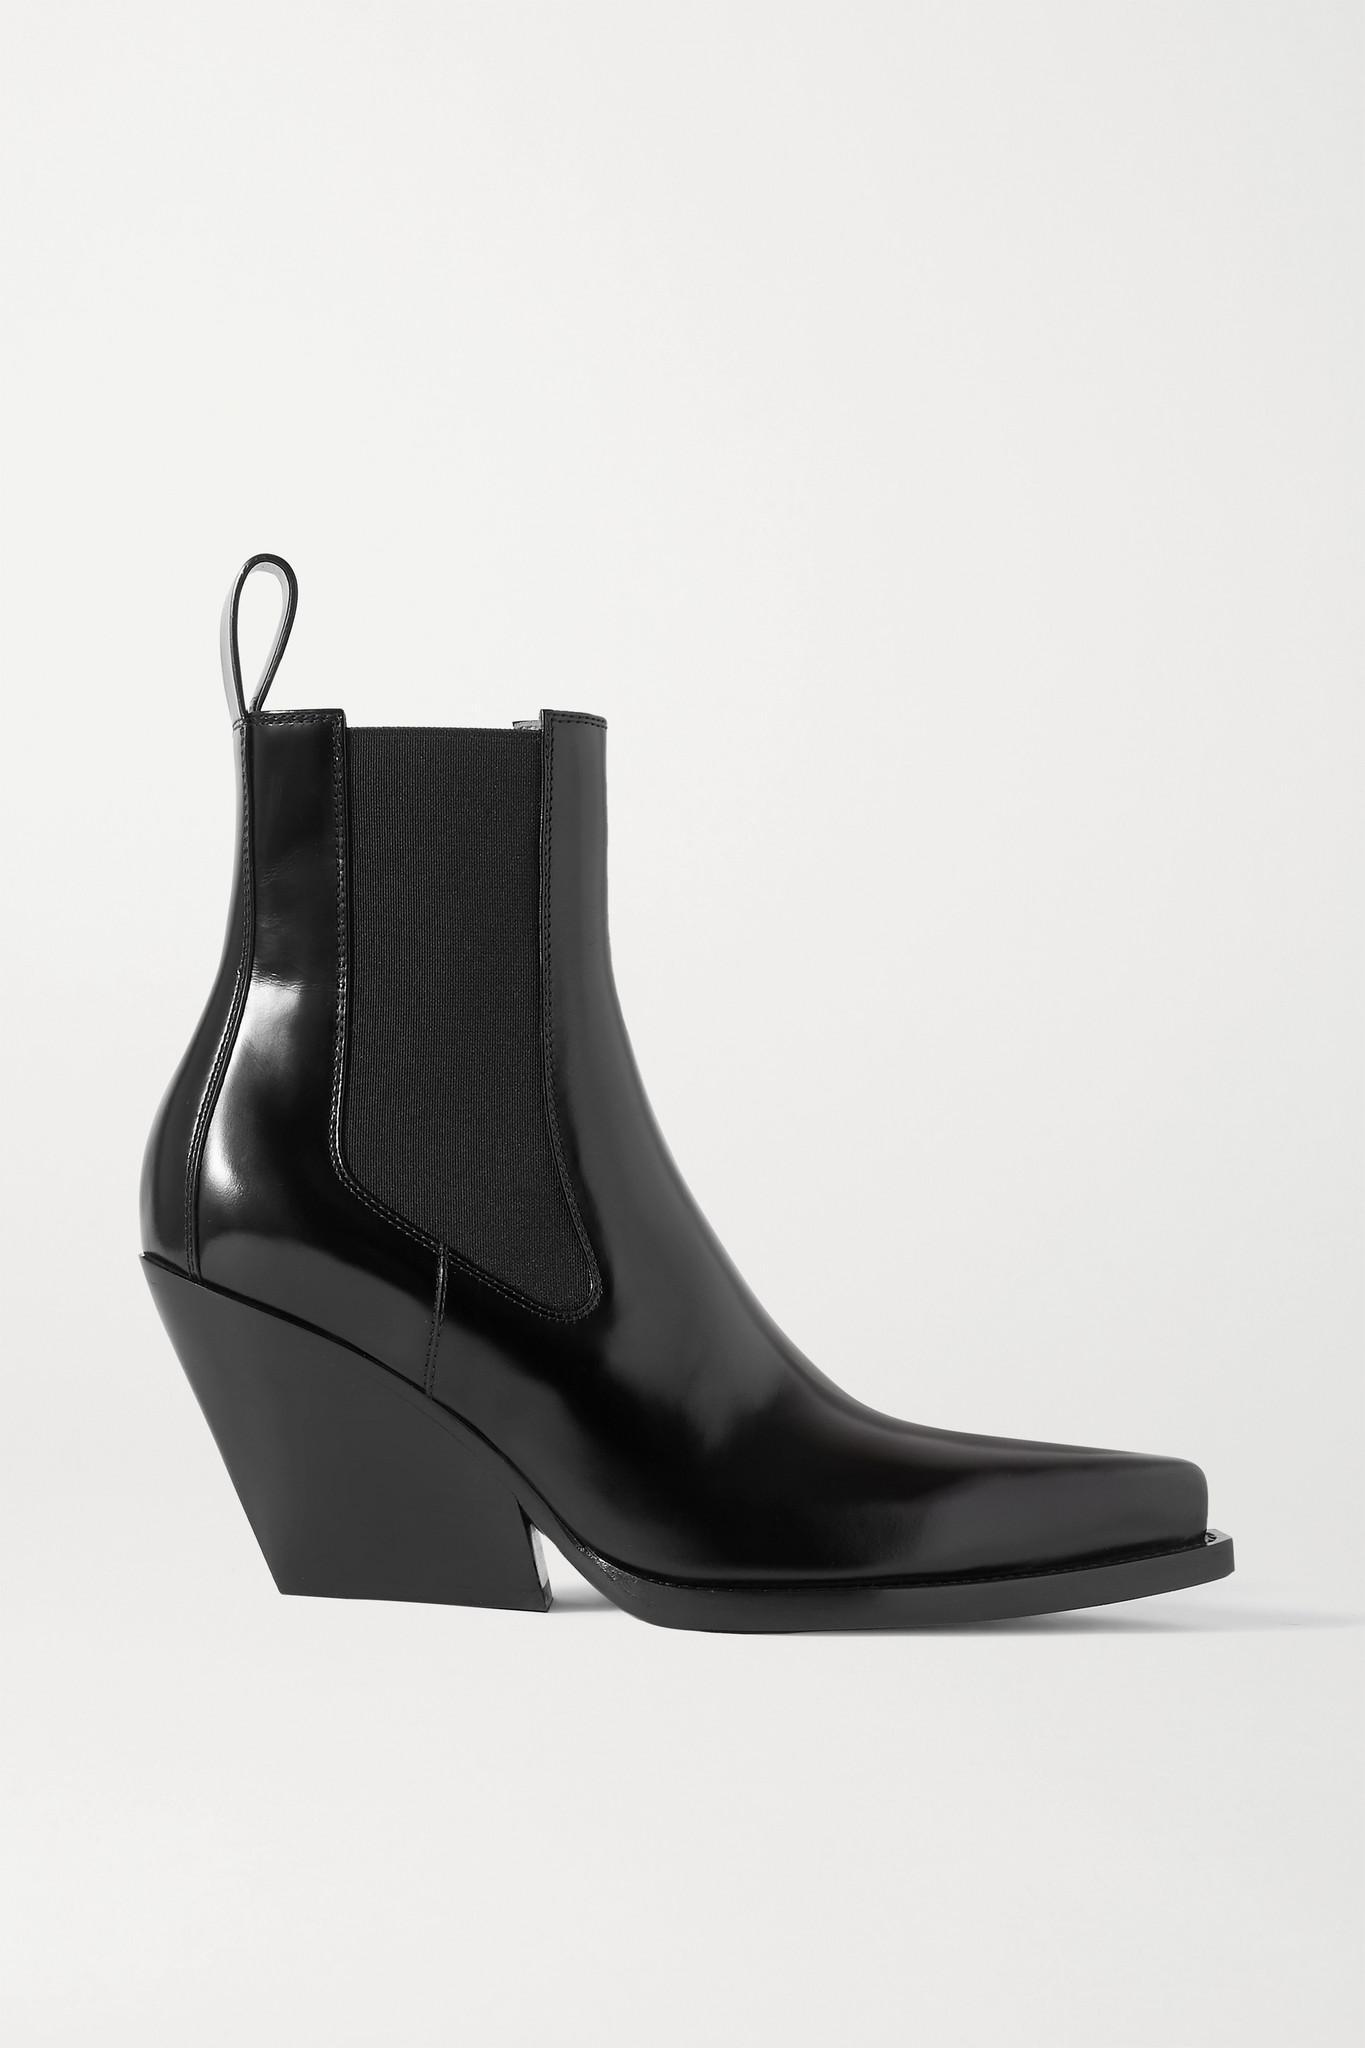 BOTTEGA VENETA - 亮面皮革踝靴 - 黑色 - IT37.5